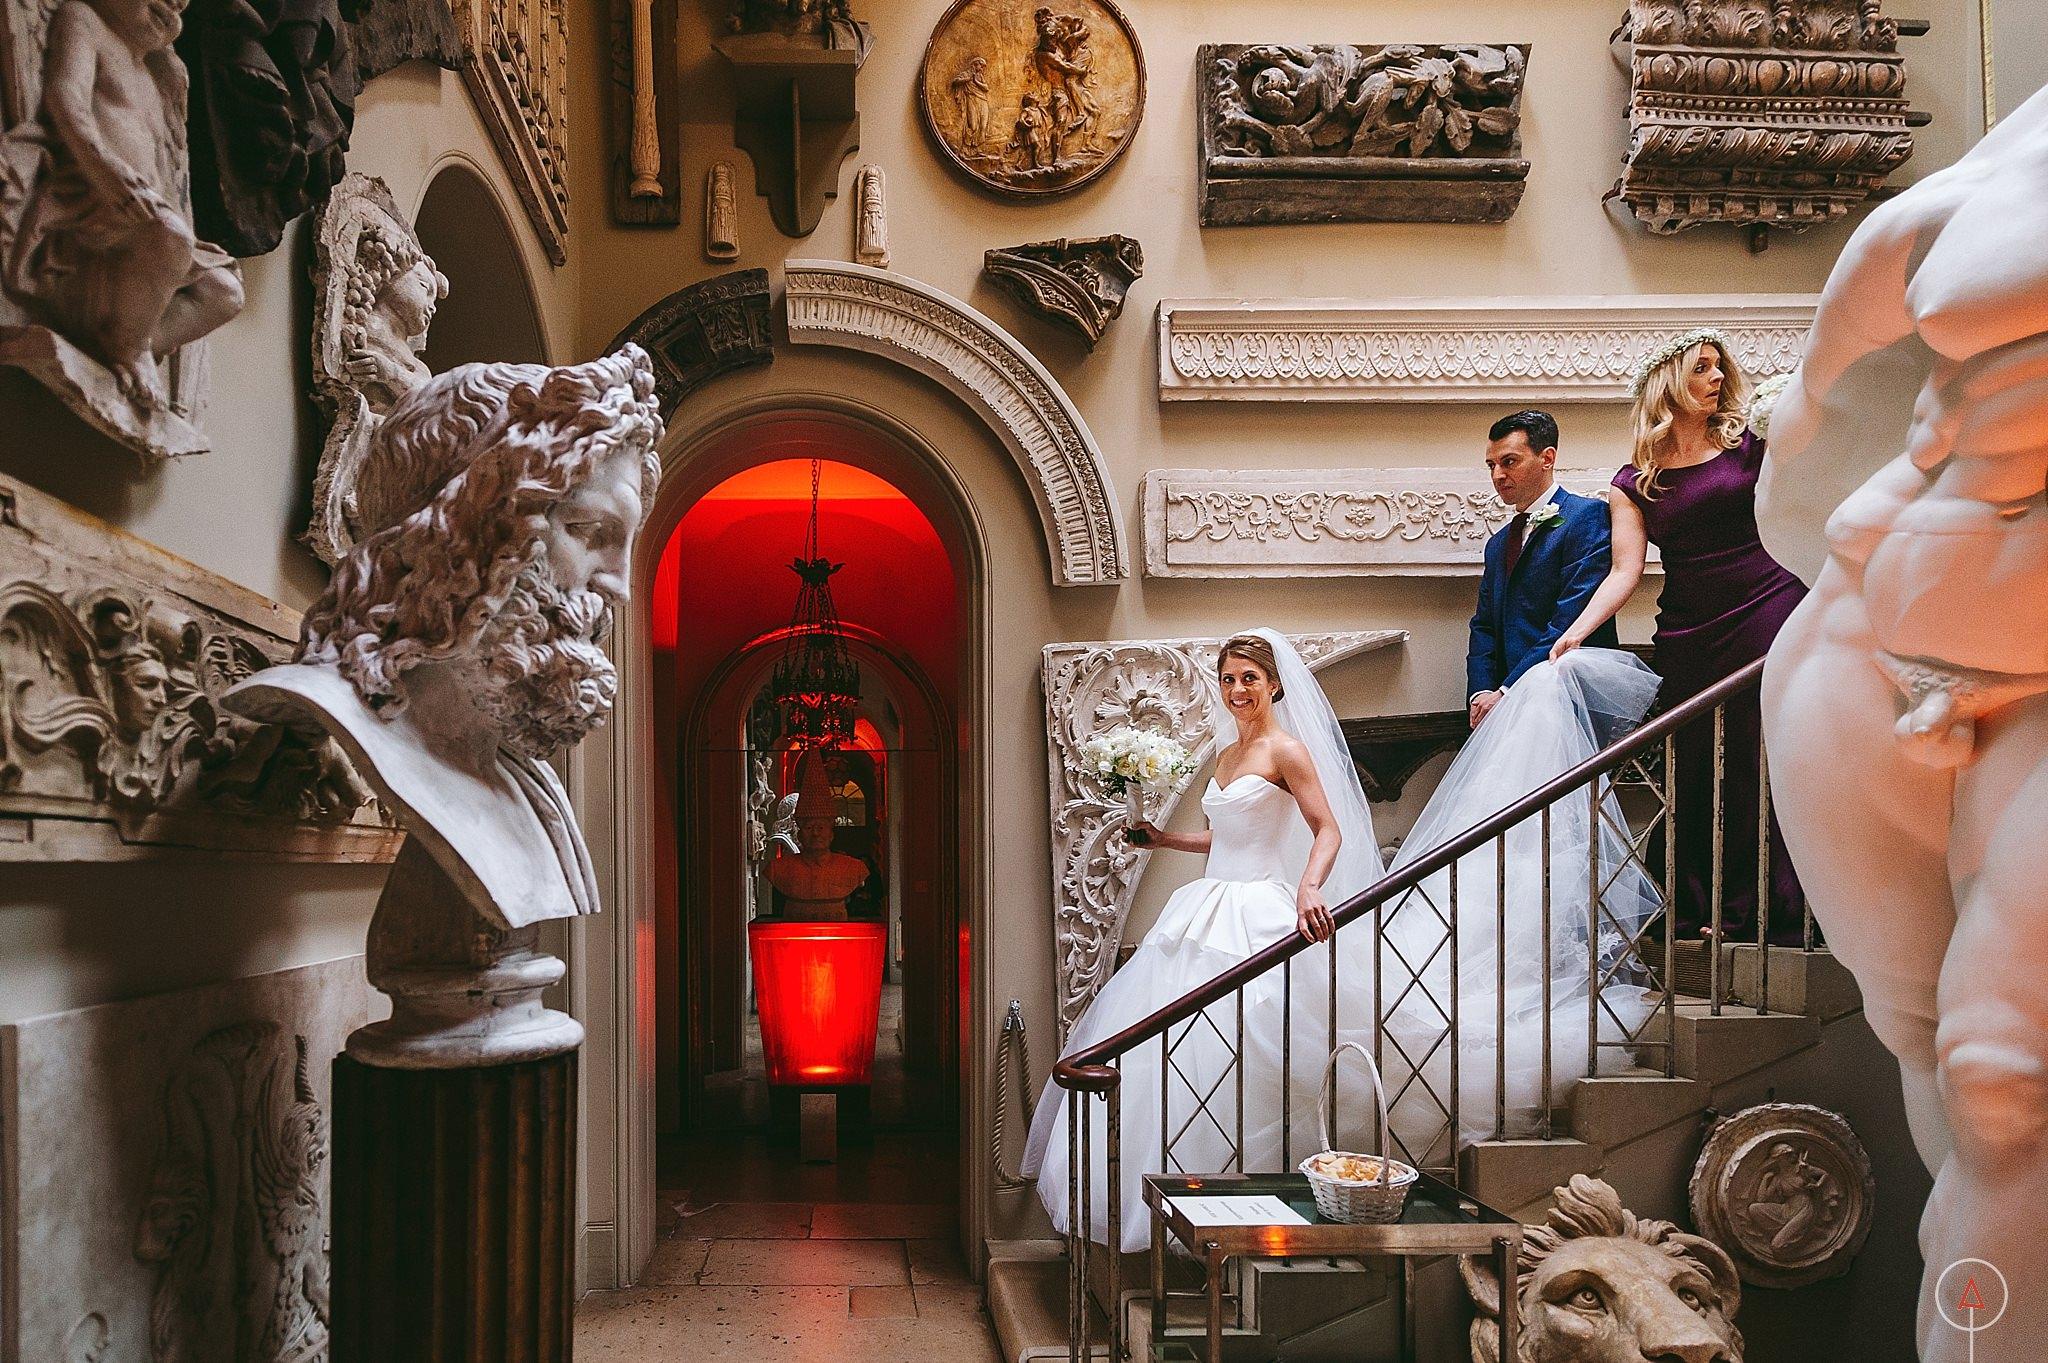 cardiff-wedding-photographer-aga-tomaszek_0247